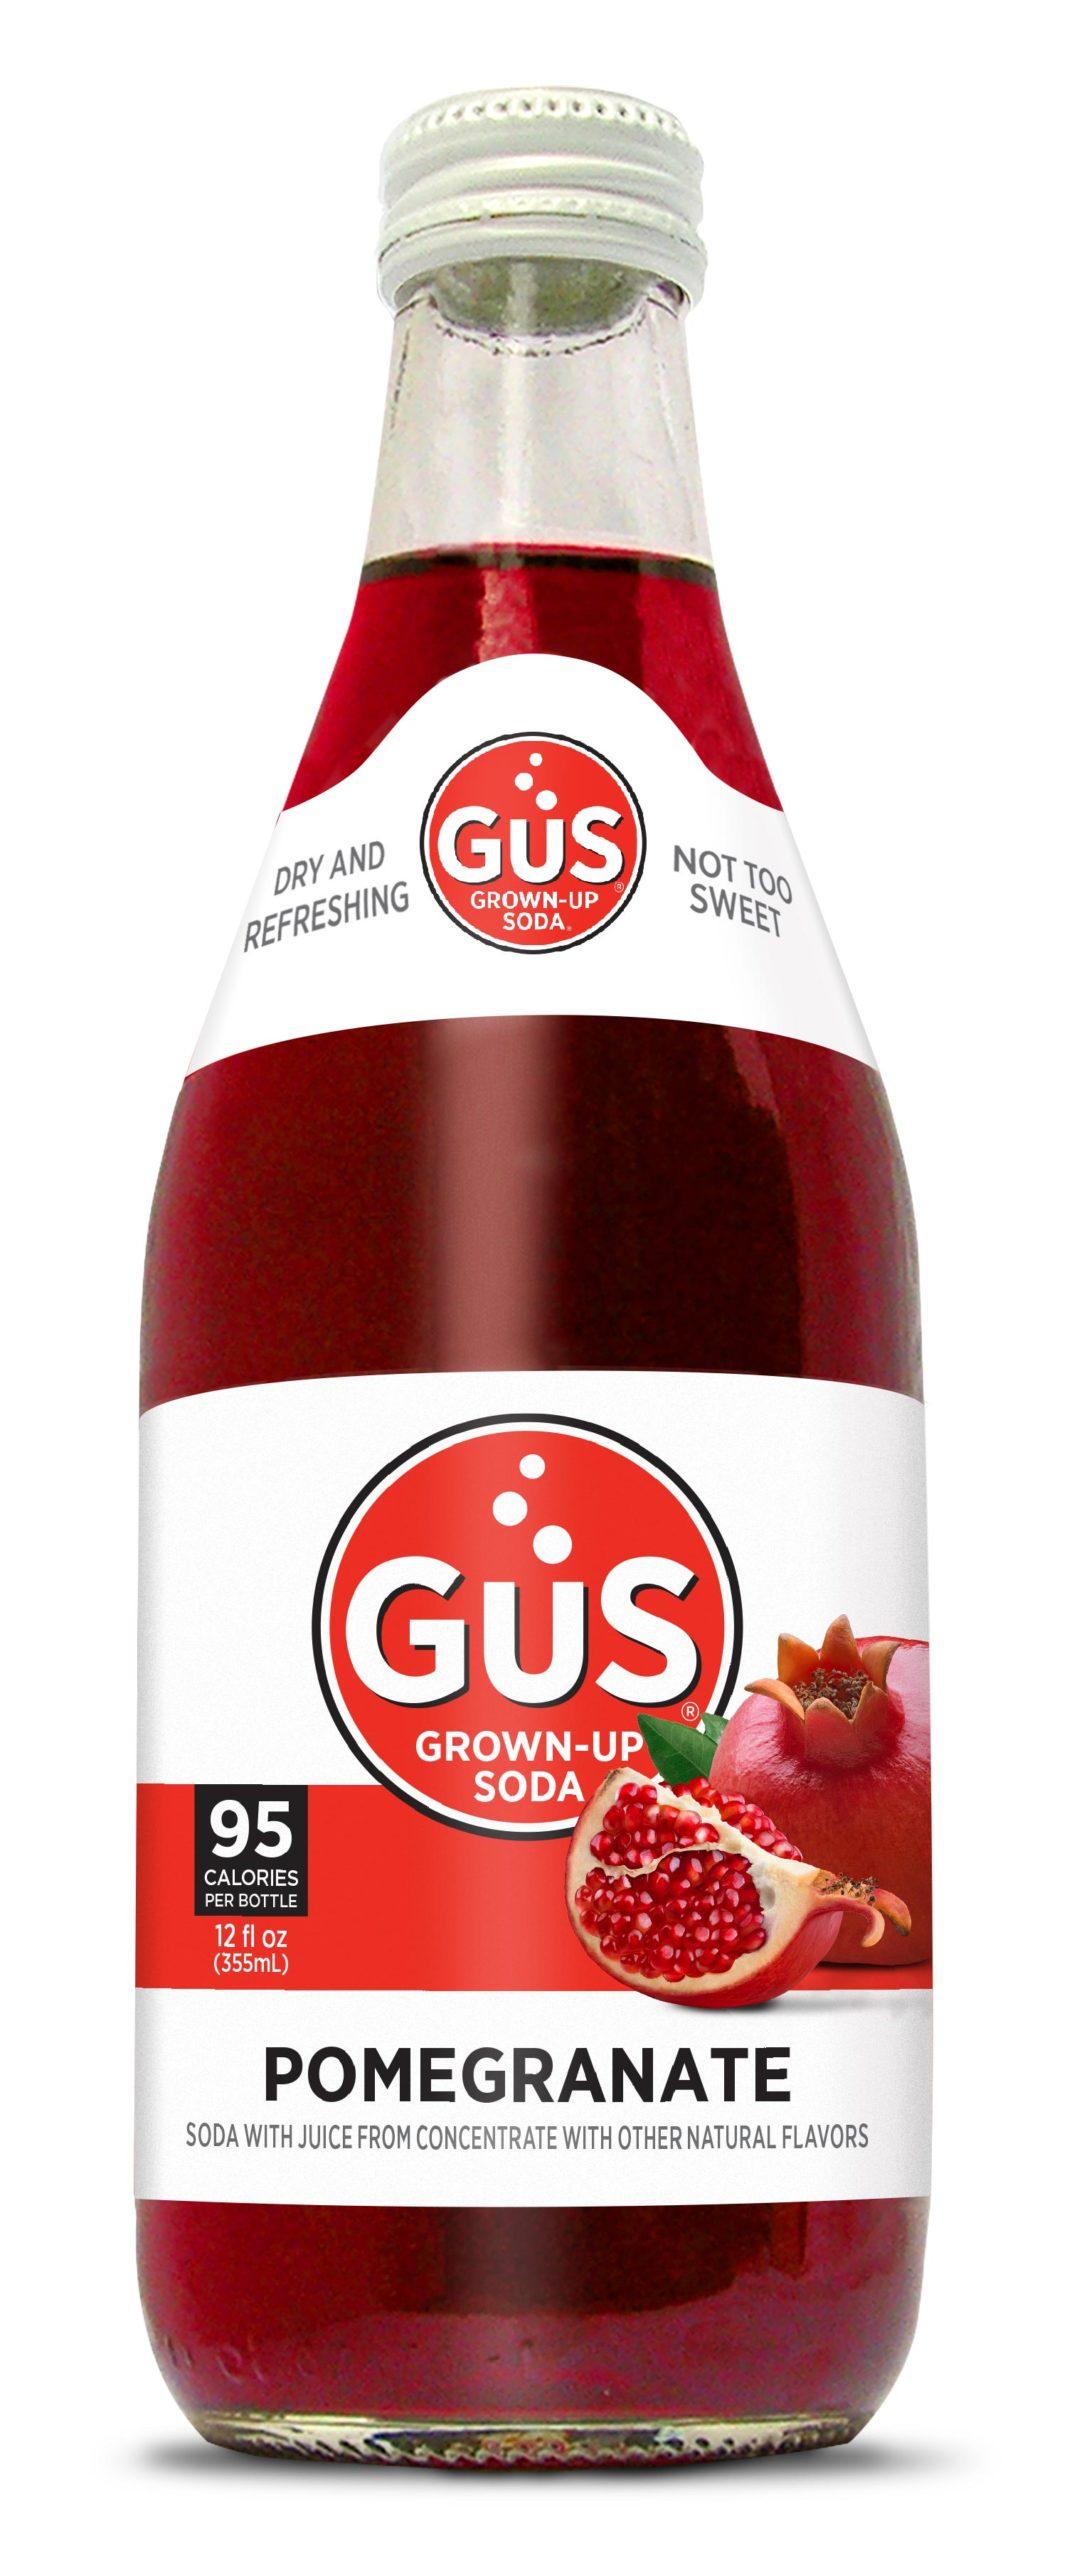 GuS Pomegranate Soda